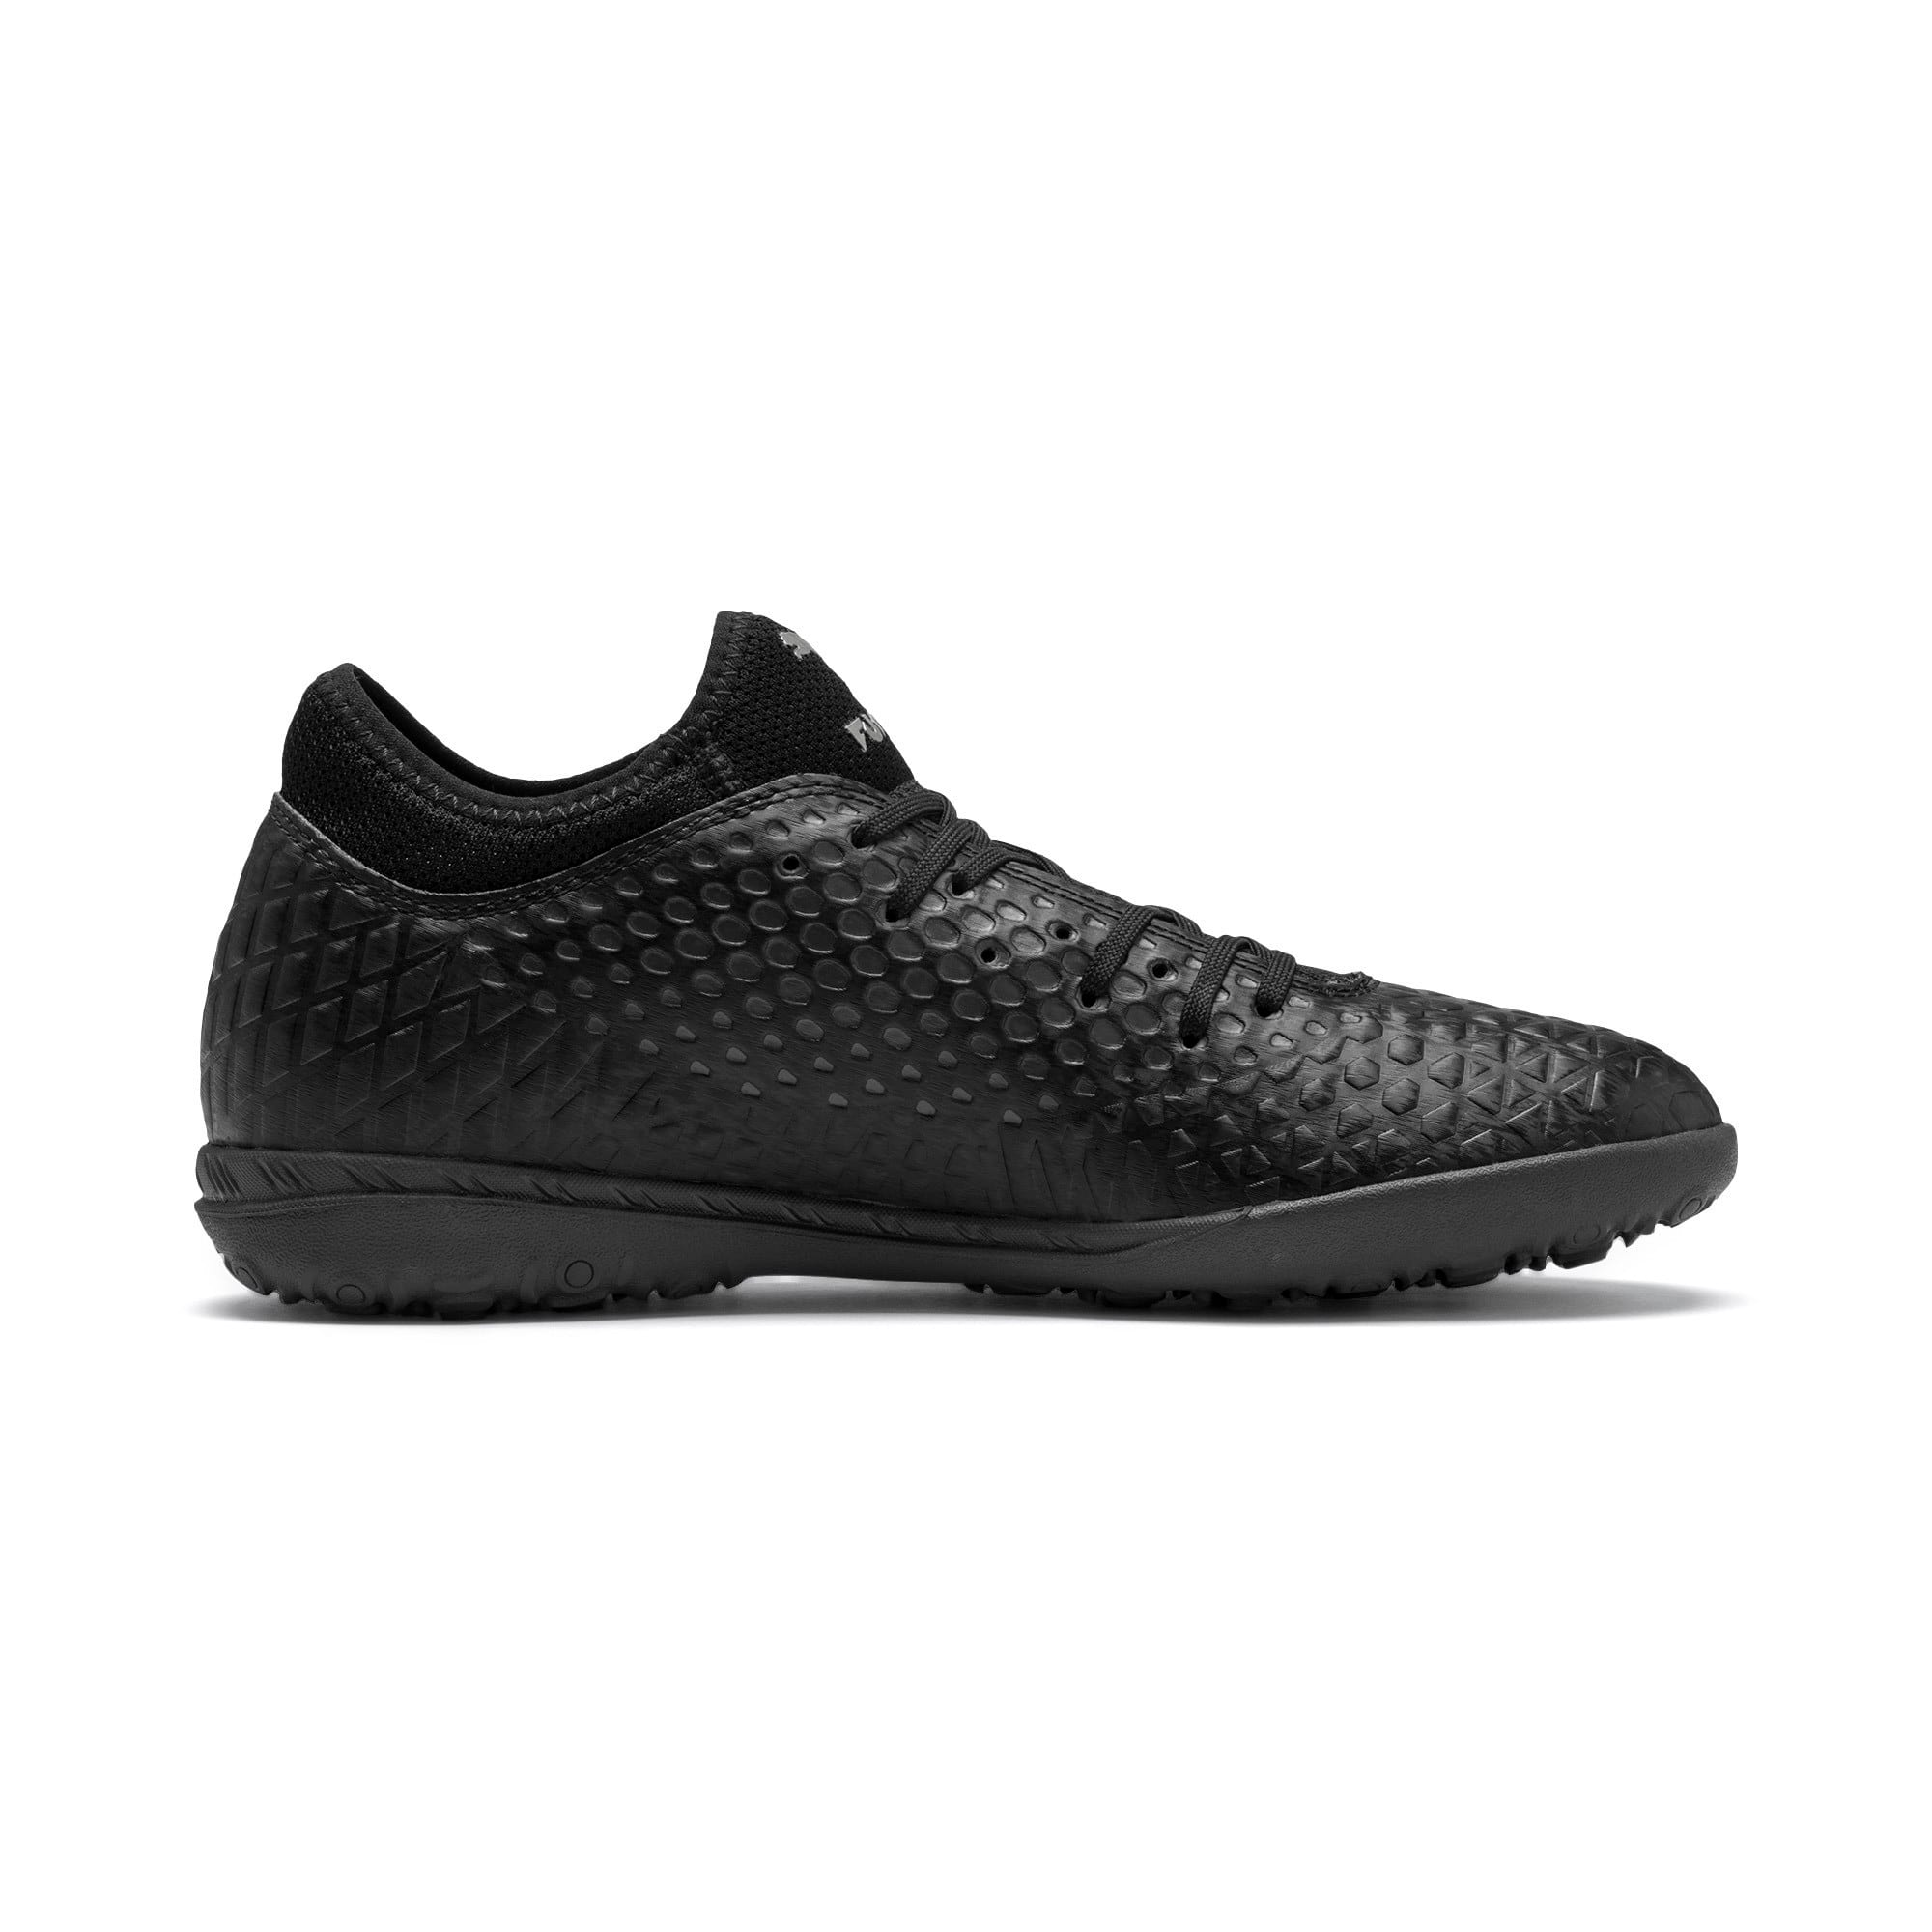 Thumbnail 6 of FUTURE 4.4 TT Men's Football Boots, Black-Black-Puma Aged Silver, medium